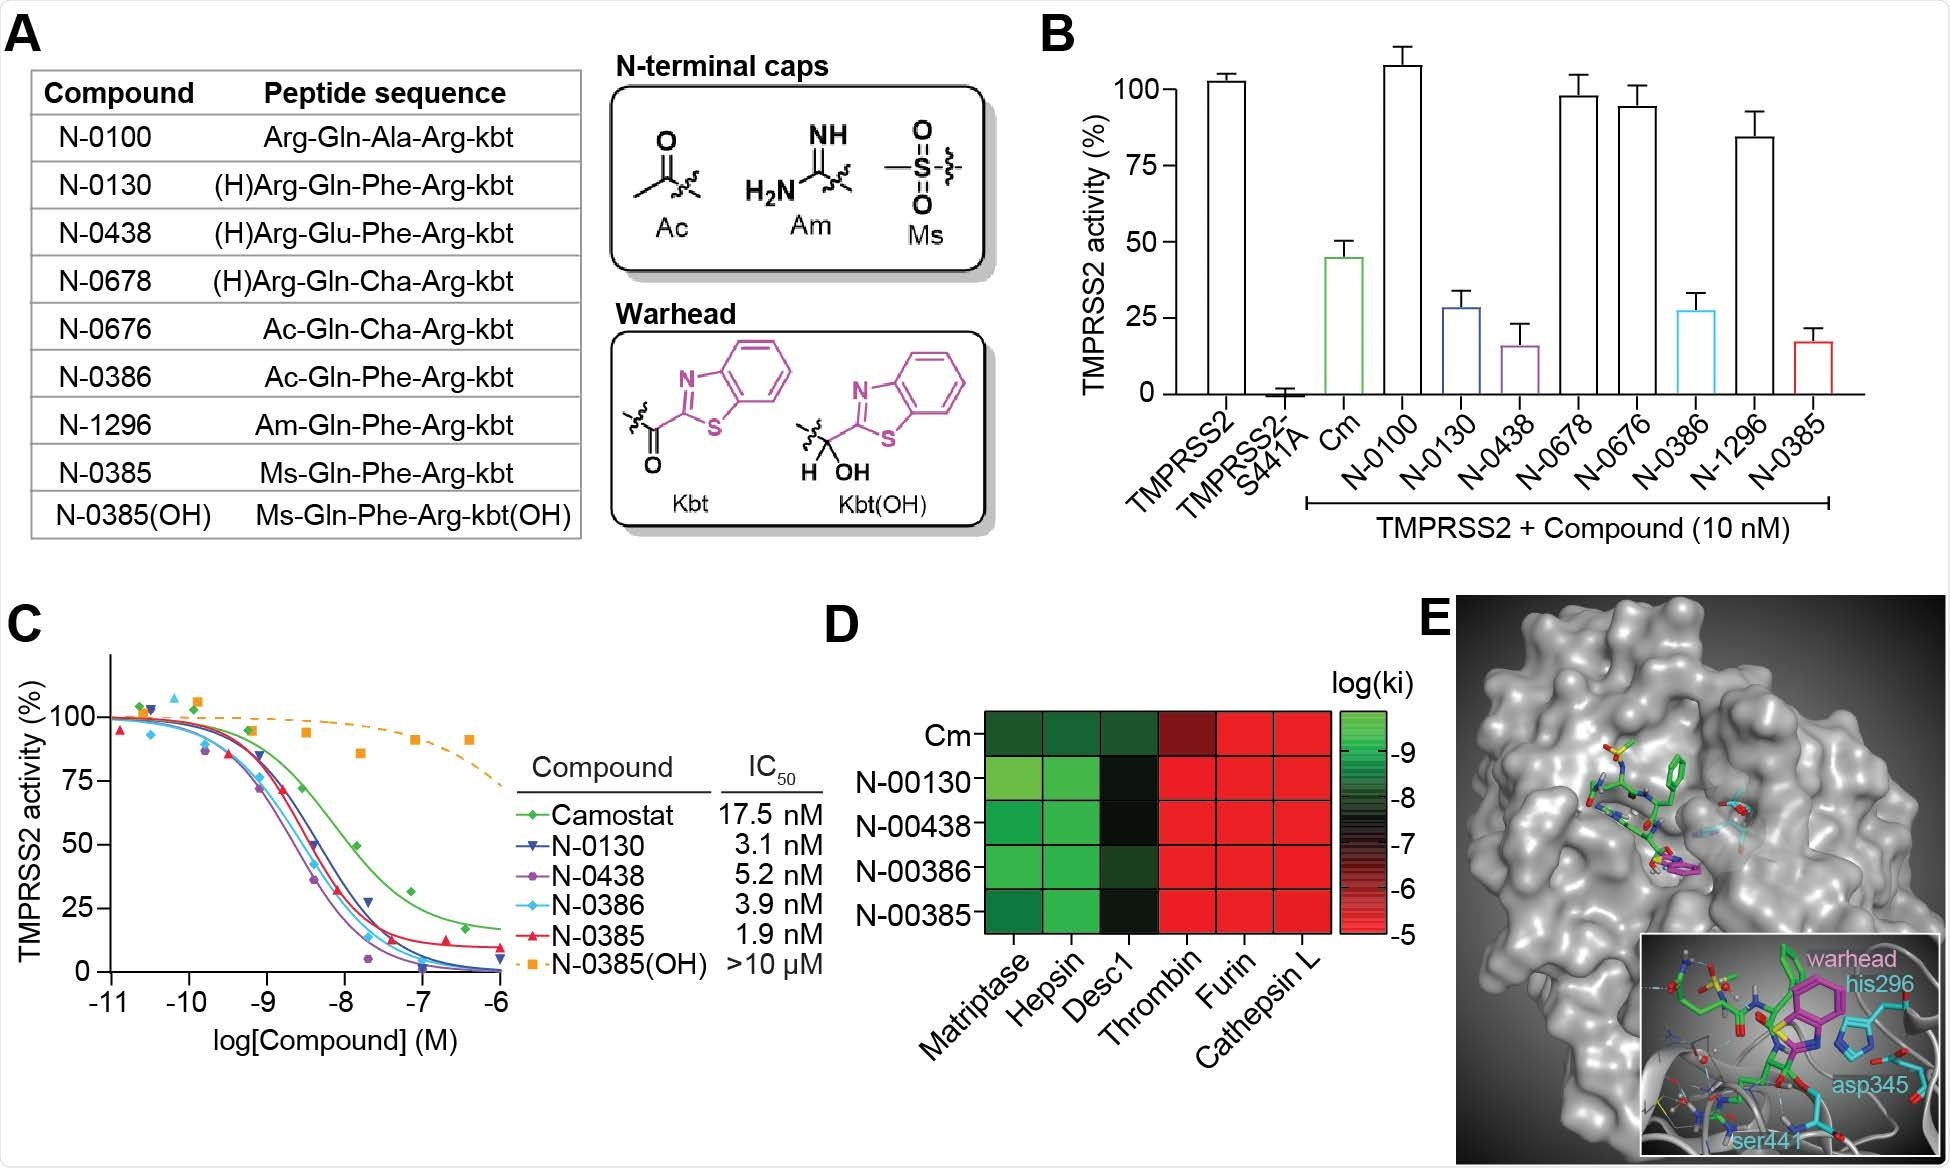 Ketobenzothiazole-based small-molecule peptidomimetics are potent TMPRSS2 inhibitors.